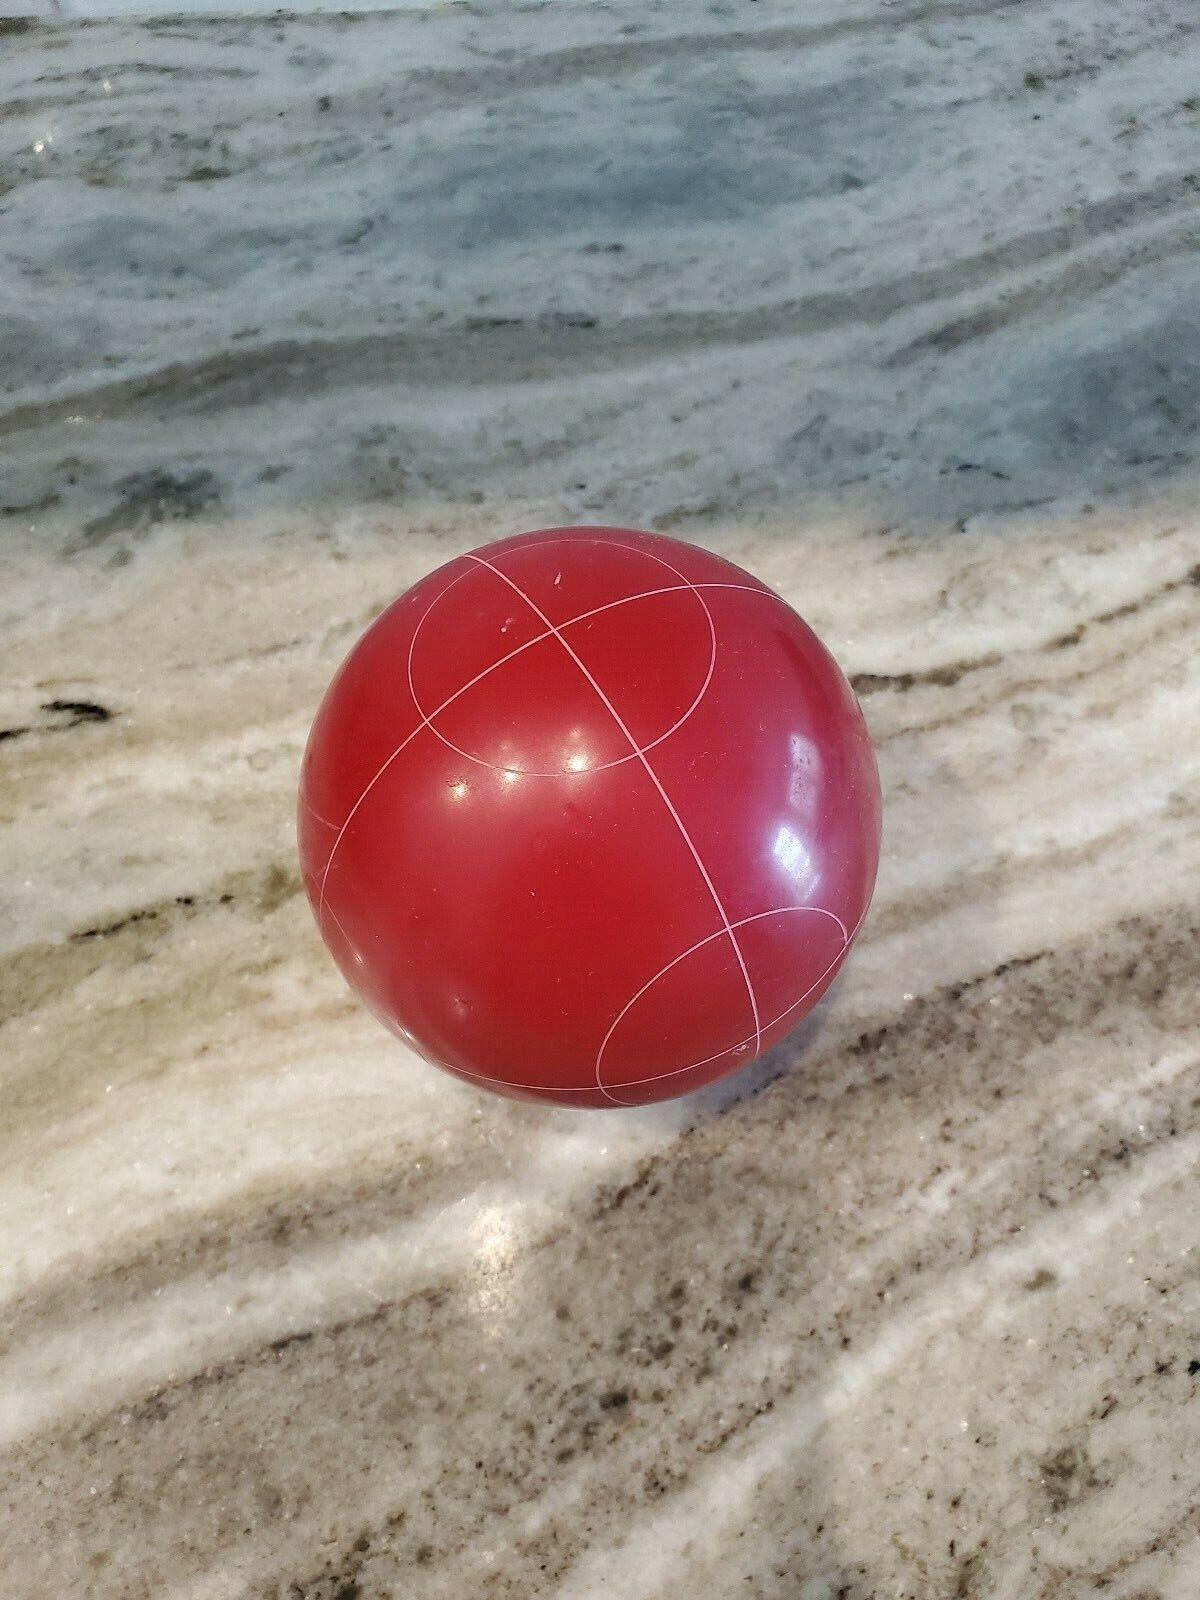 VGC EDDIE BAUER RED CIRCLE PATTERN BOCCE BALL